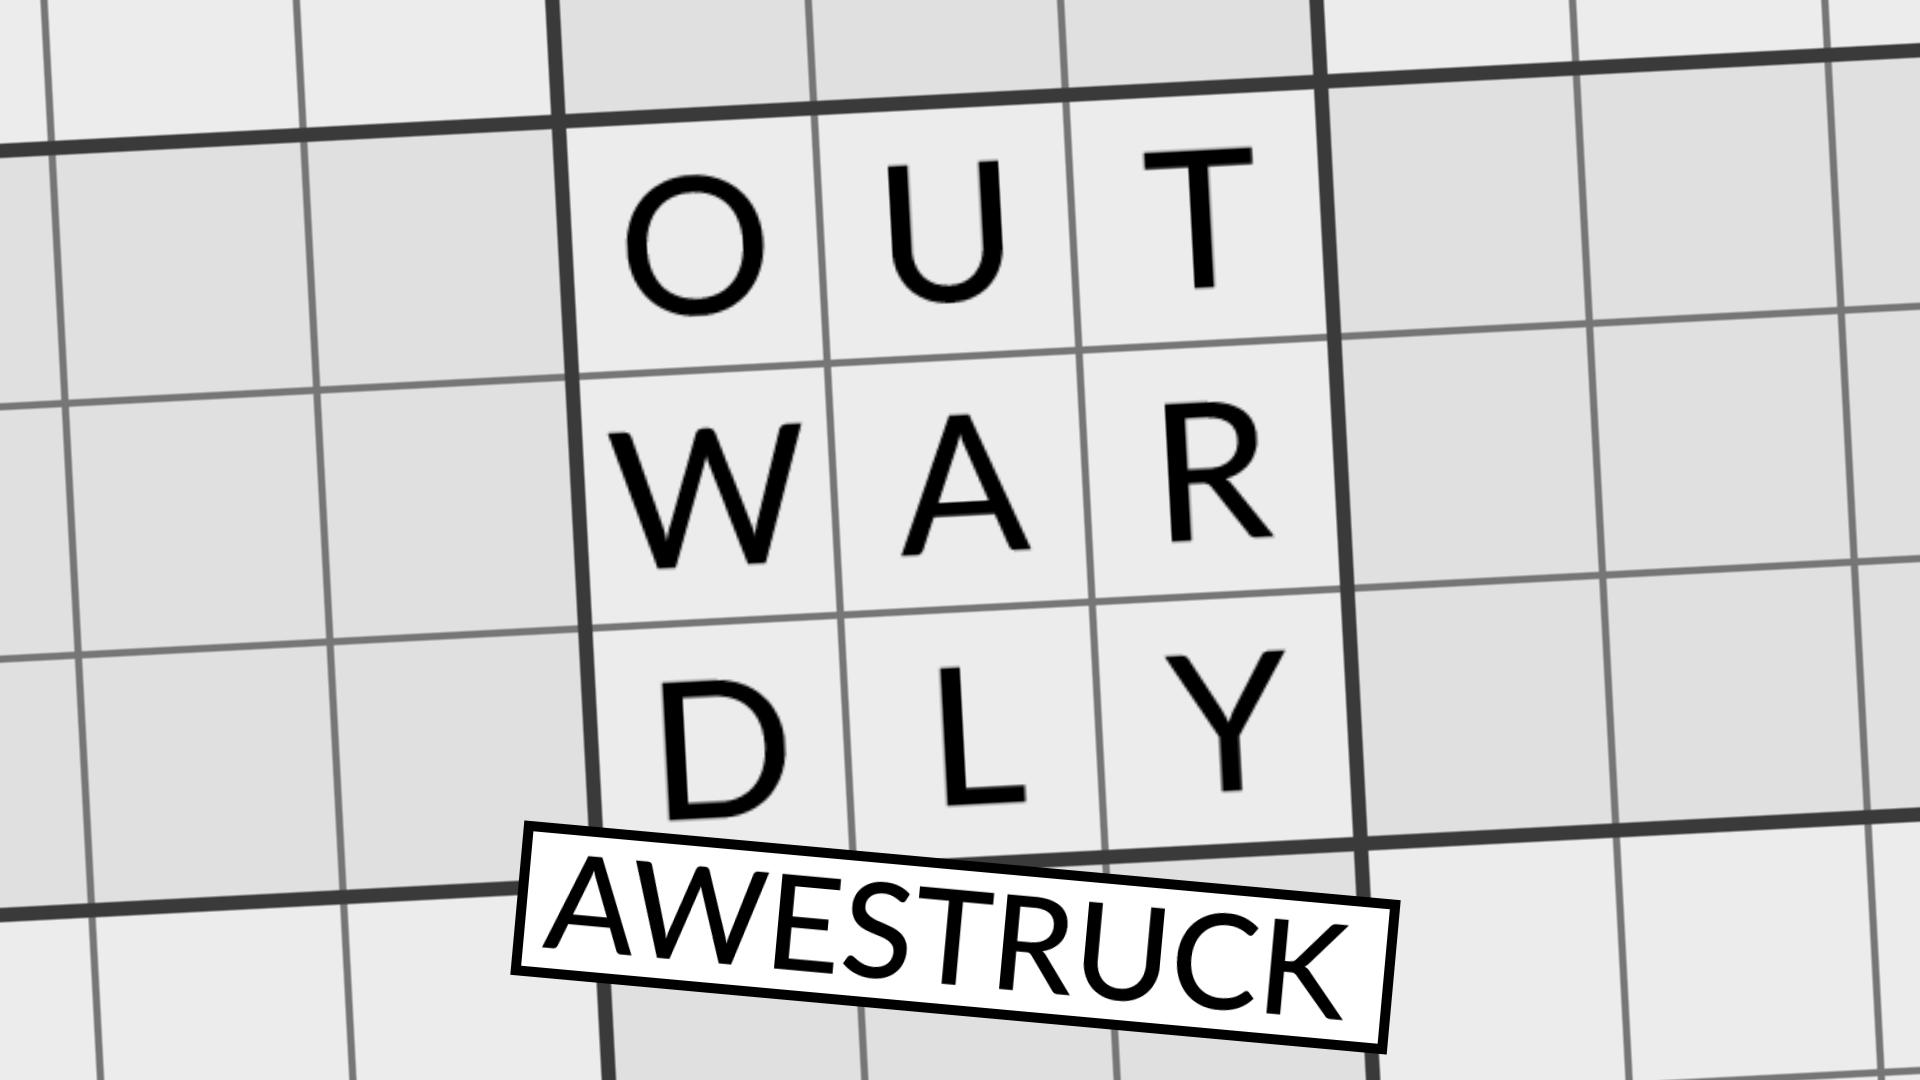 Outwardly Awestruck